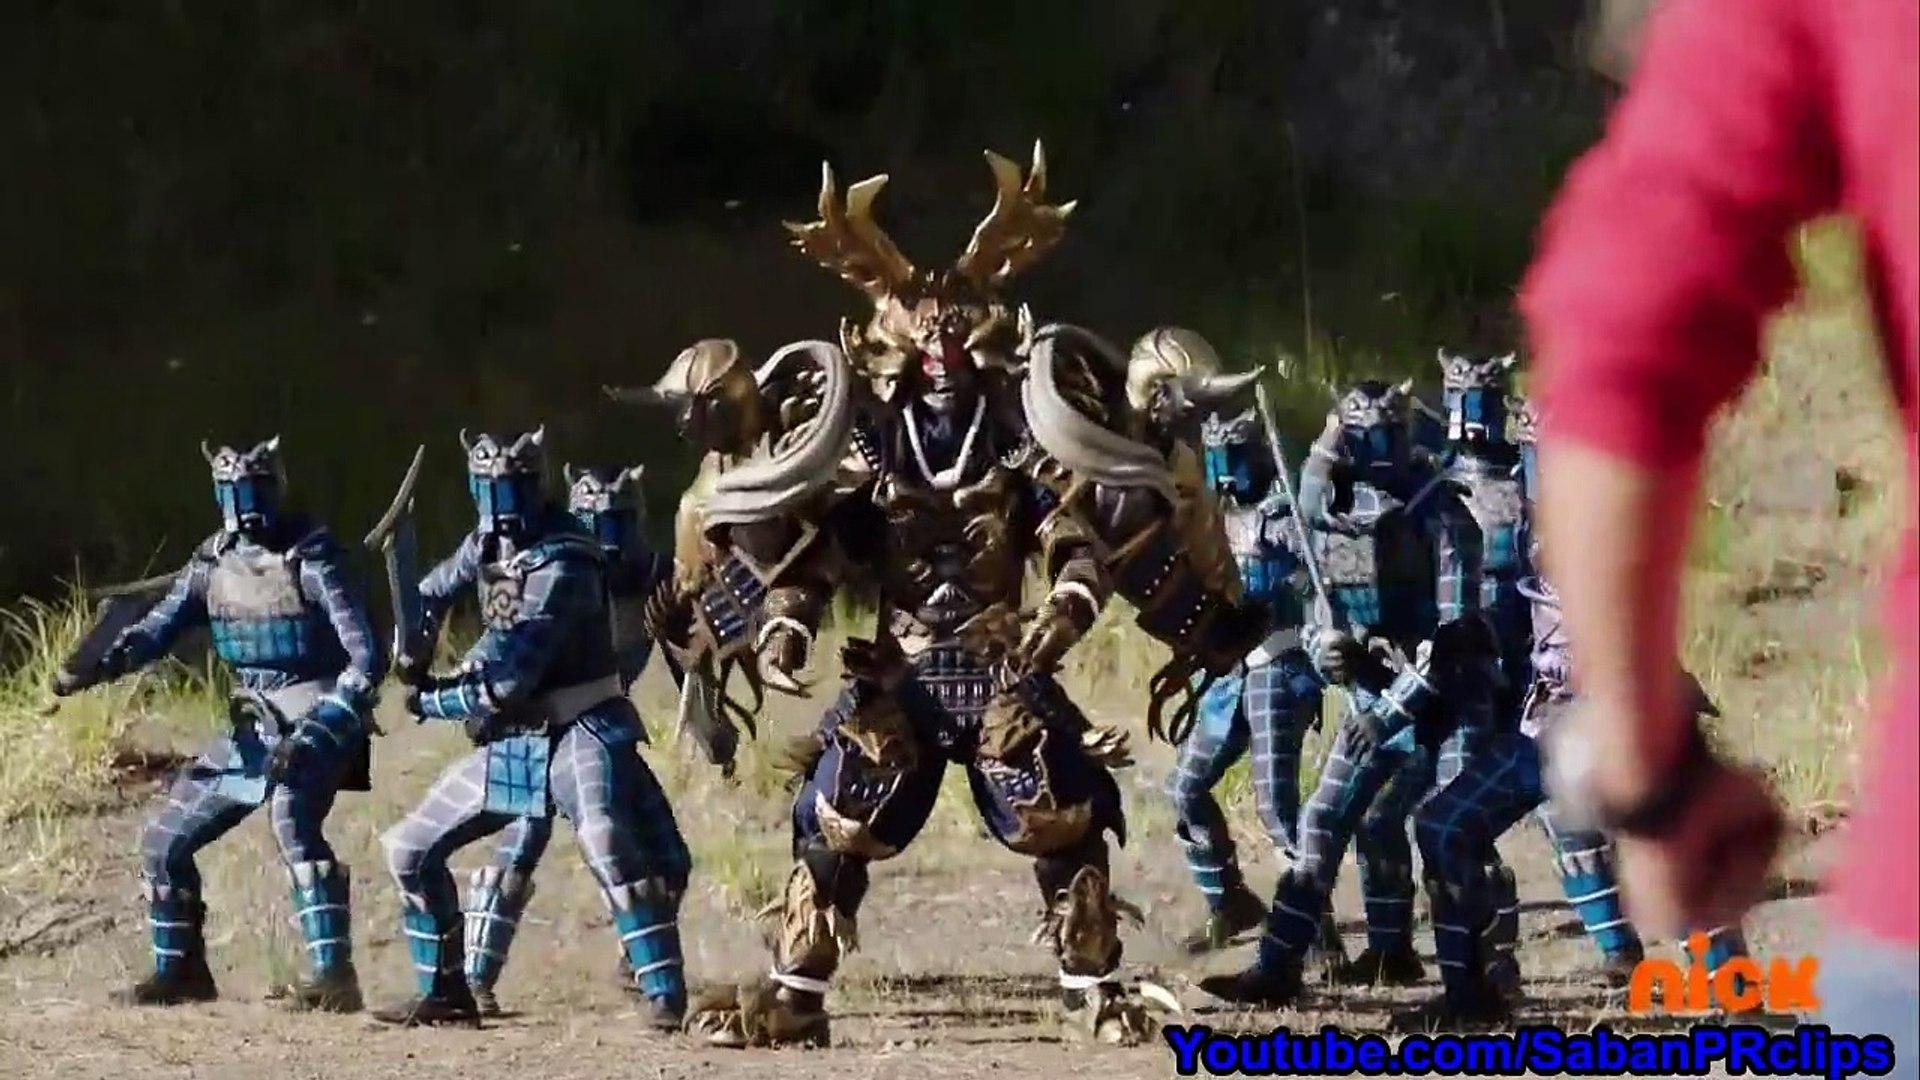 Power Rangers NInja Steel Ep 20 - Gavanax Rise - What's your Choice